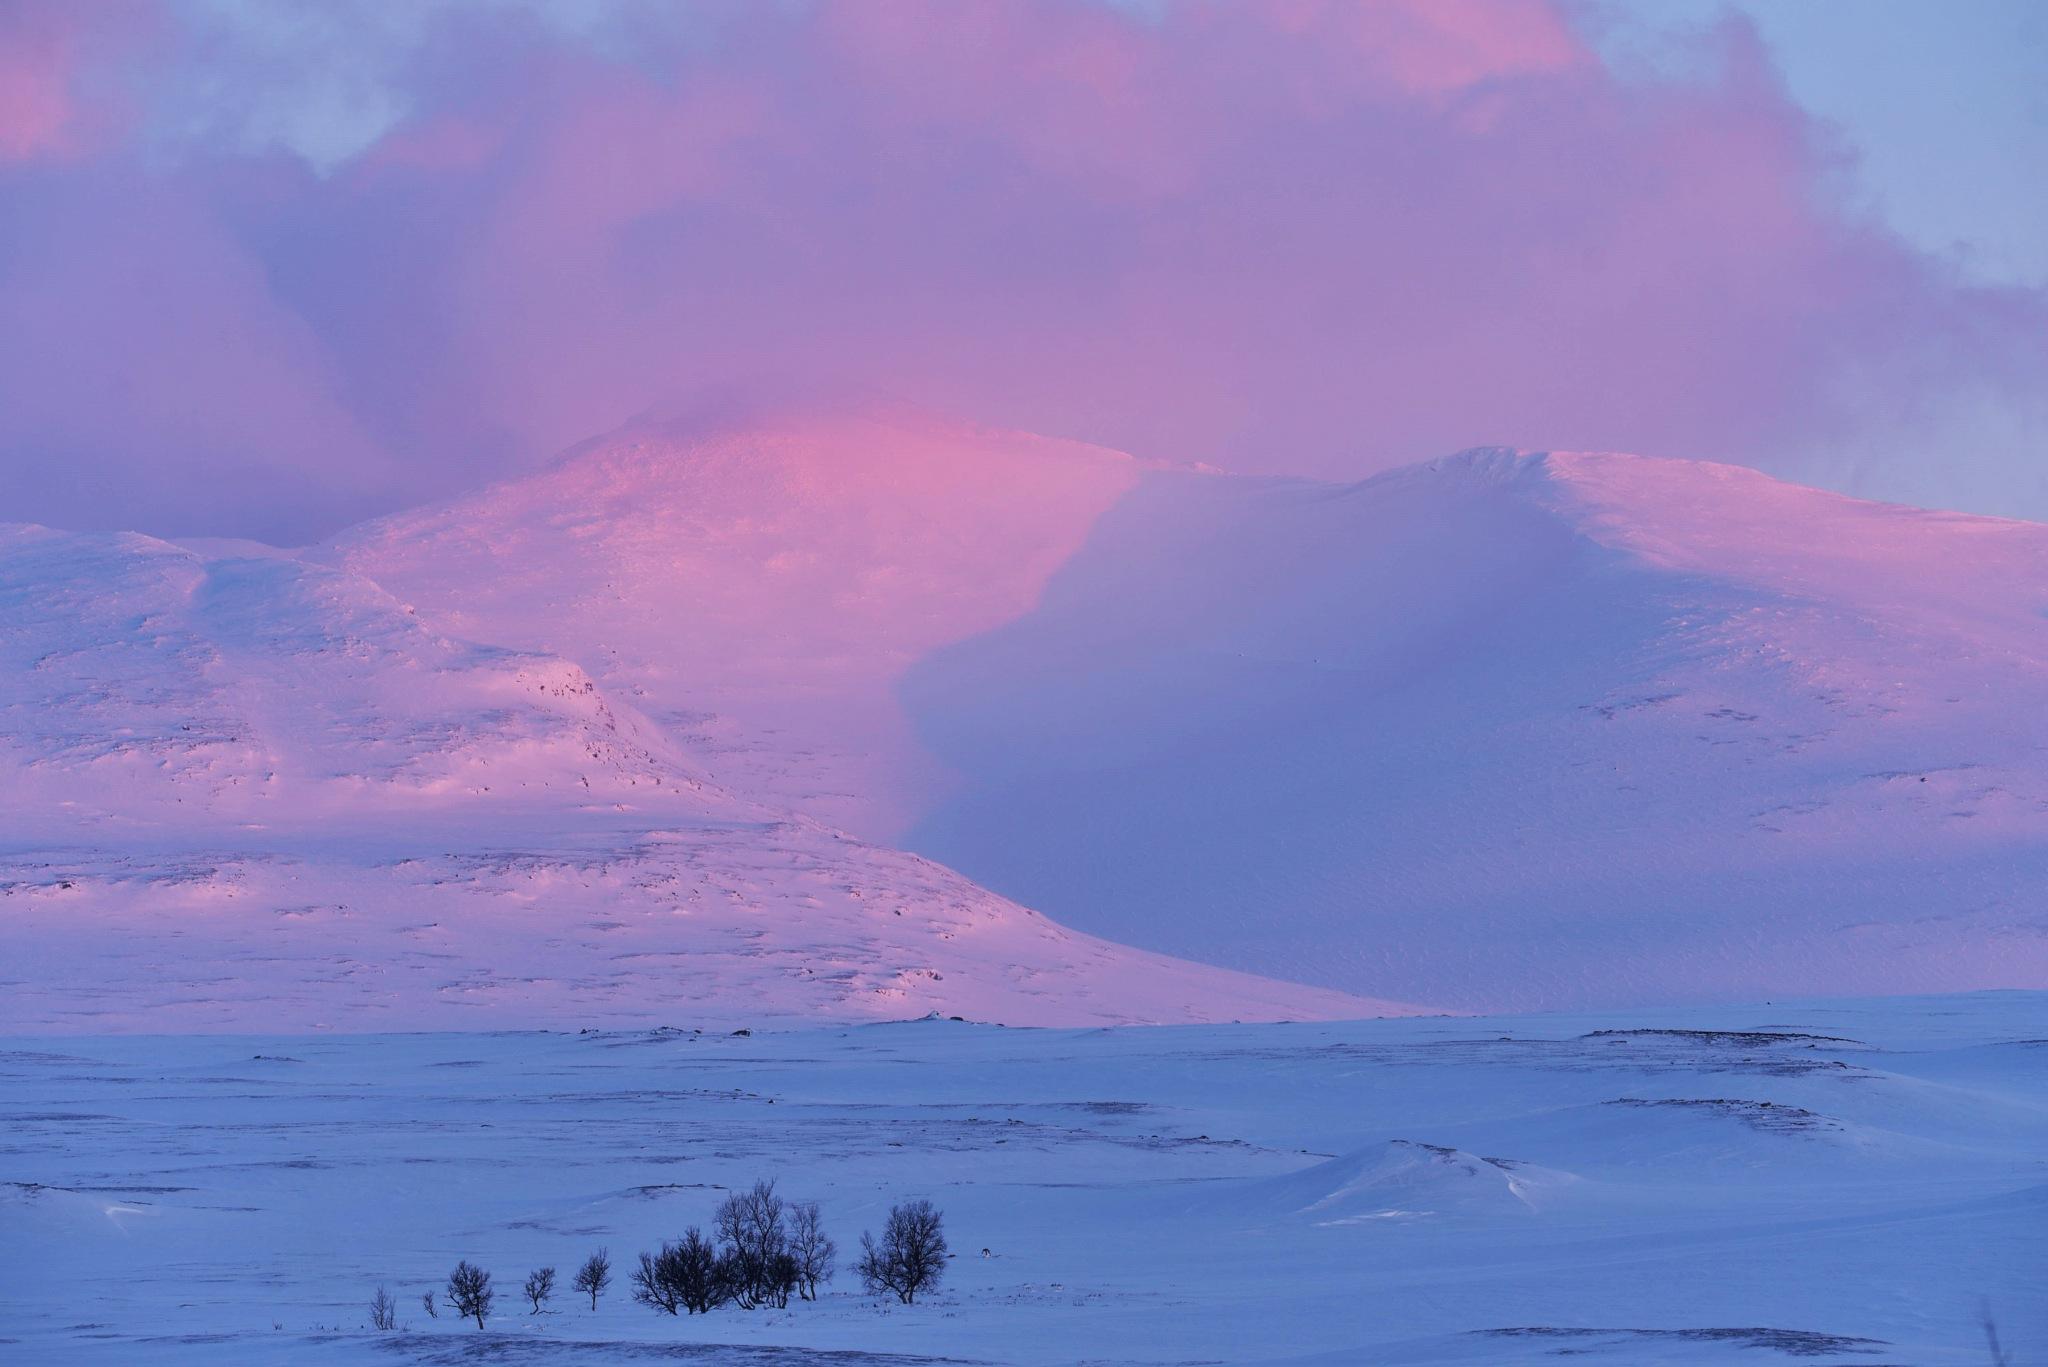 Just before sunset by E Pedersen